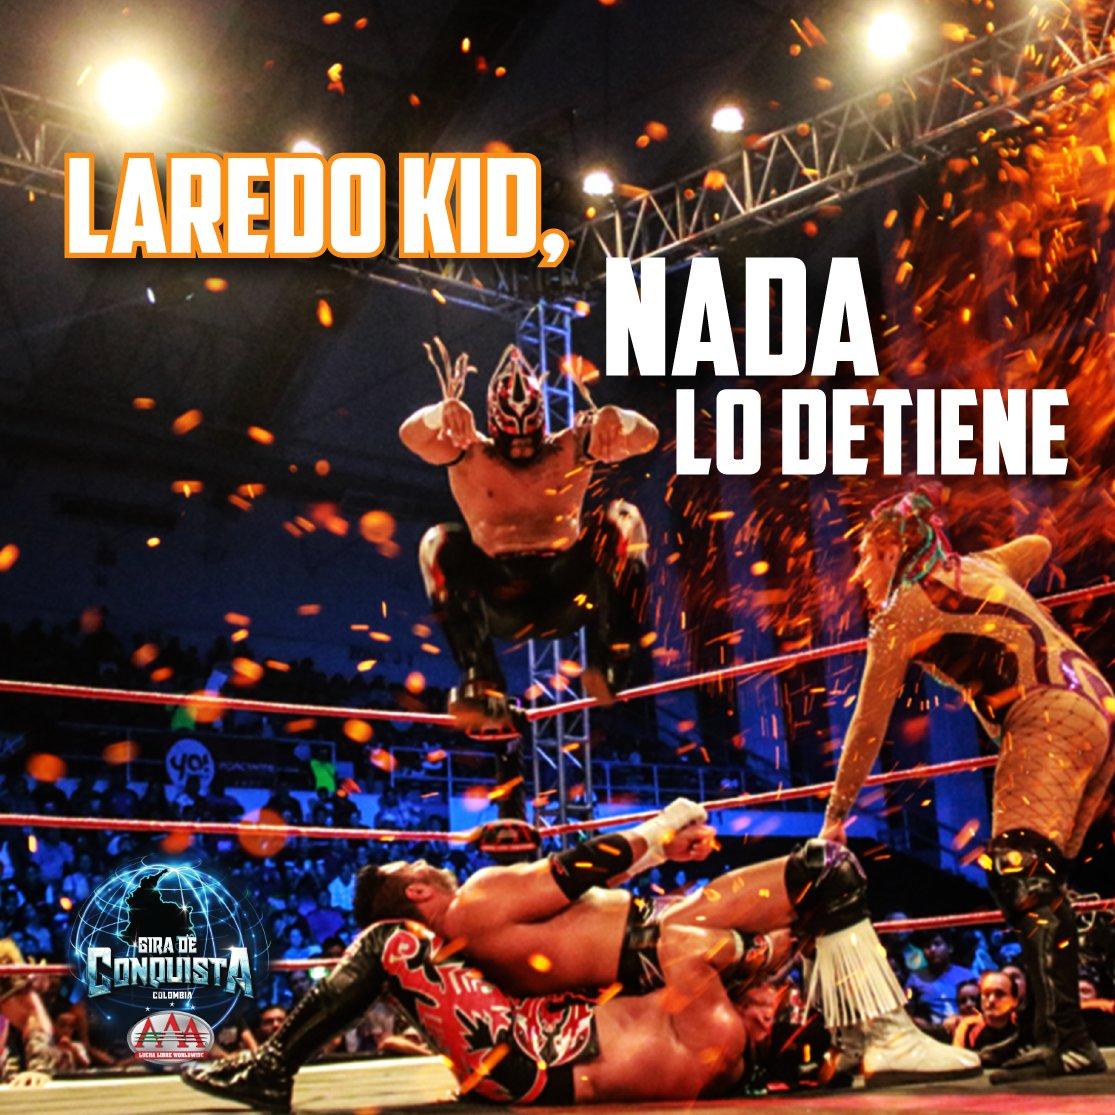 Laredo_Kid photo